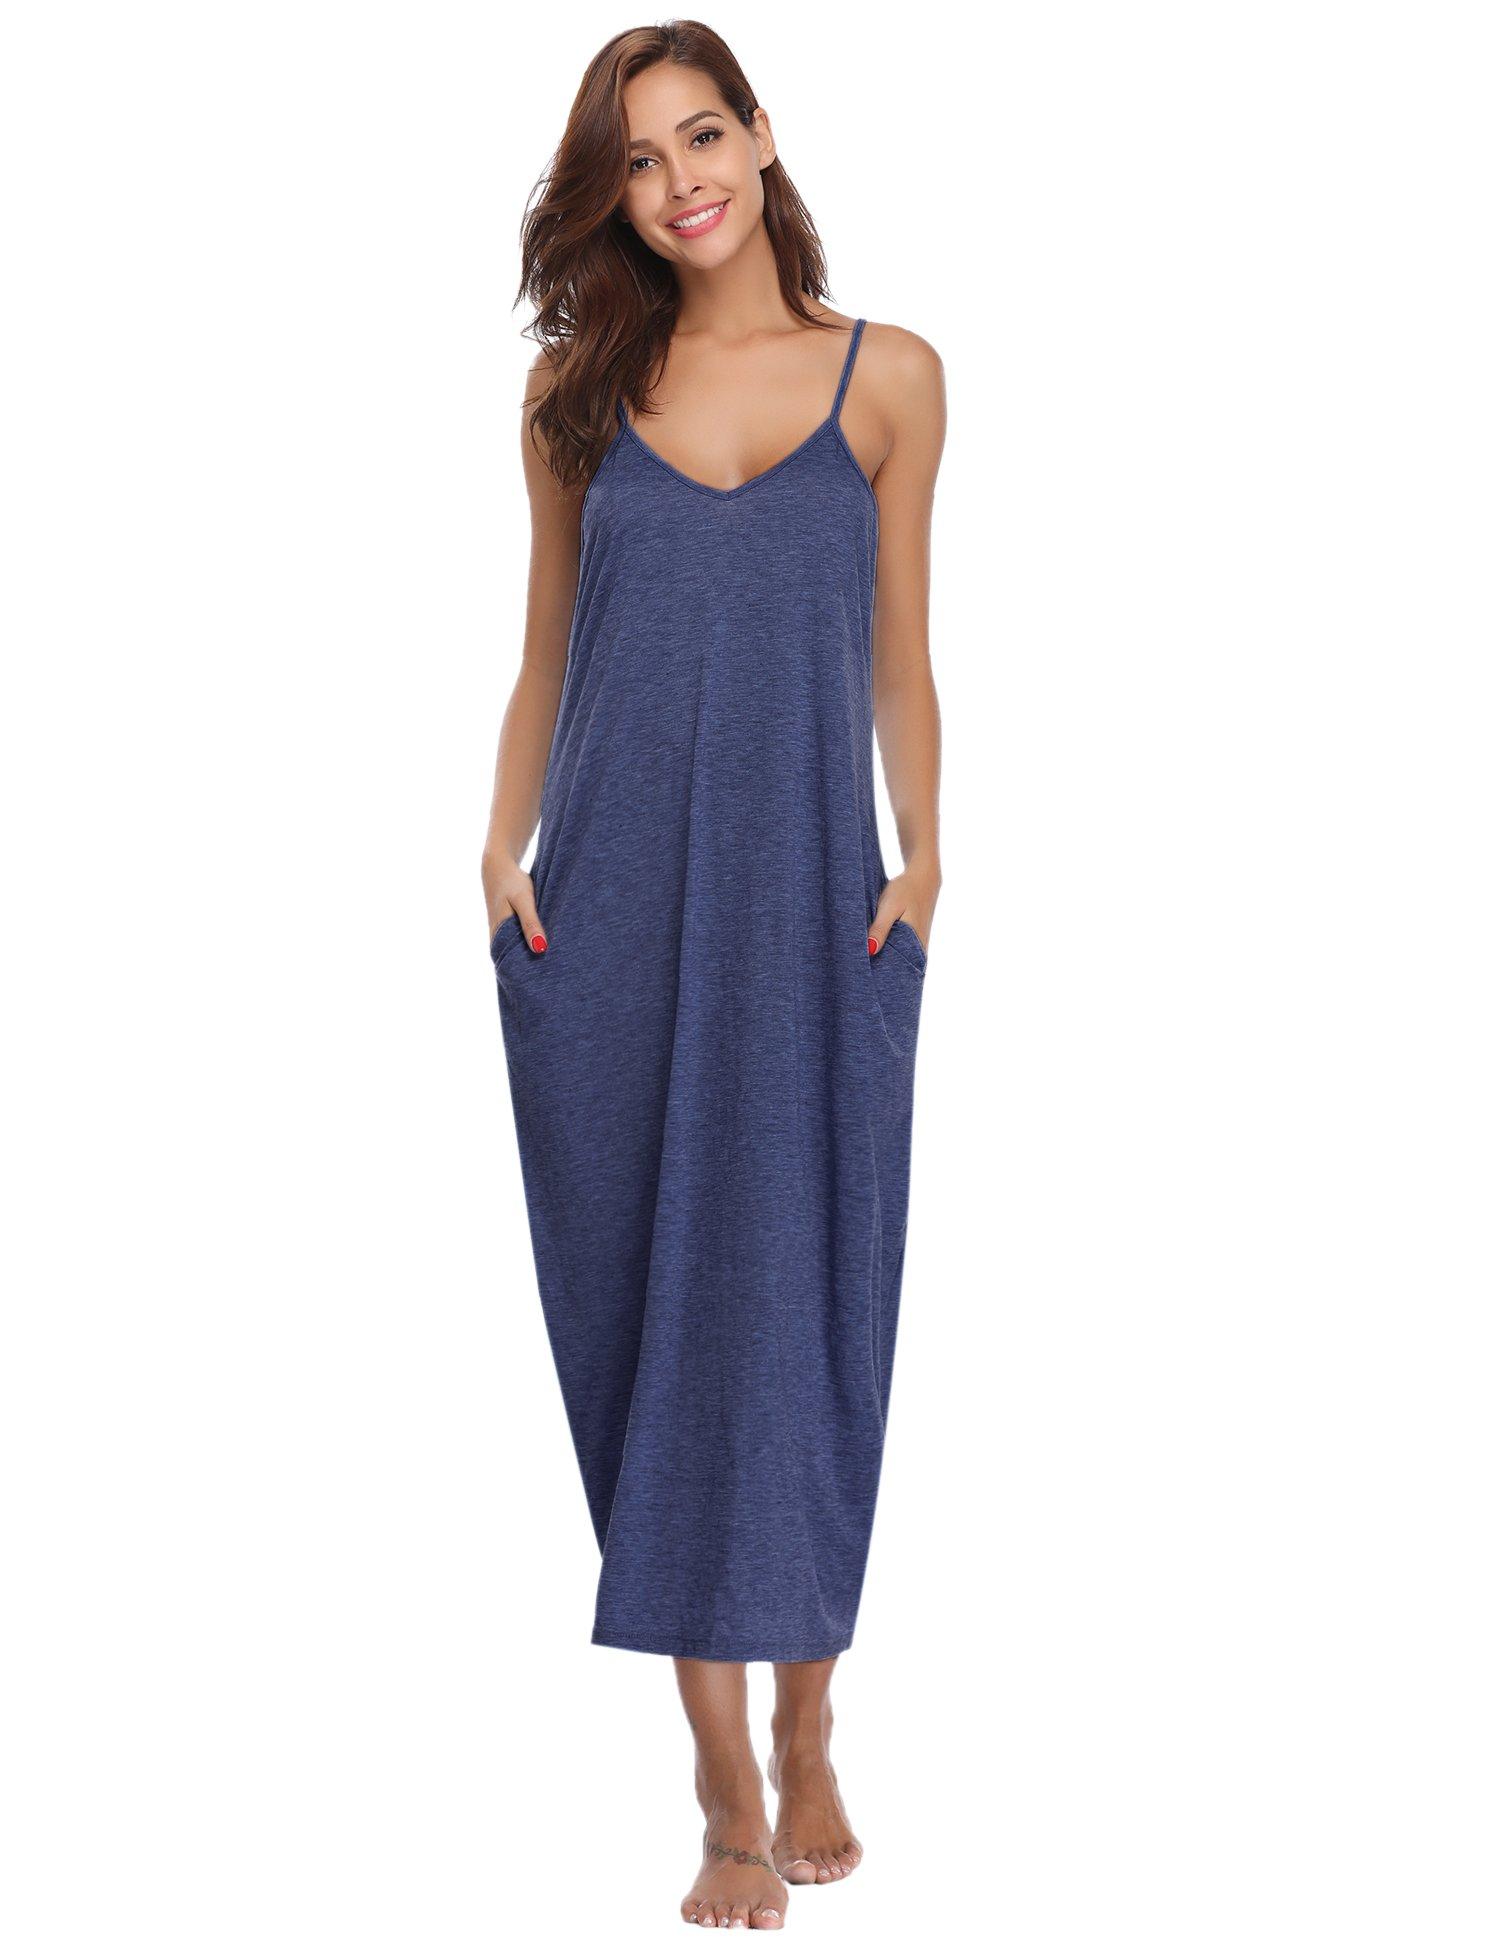 Aibrou Women's Cotton V Neck Long Nightgown Sleeveless Full Slip Night Dress